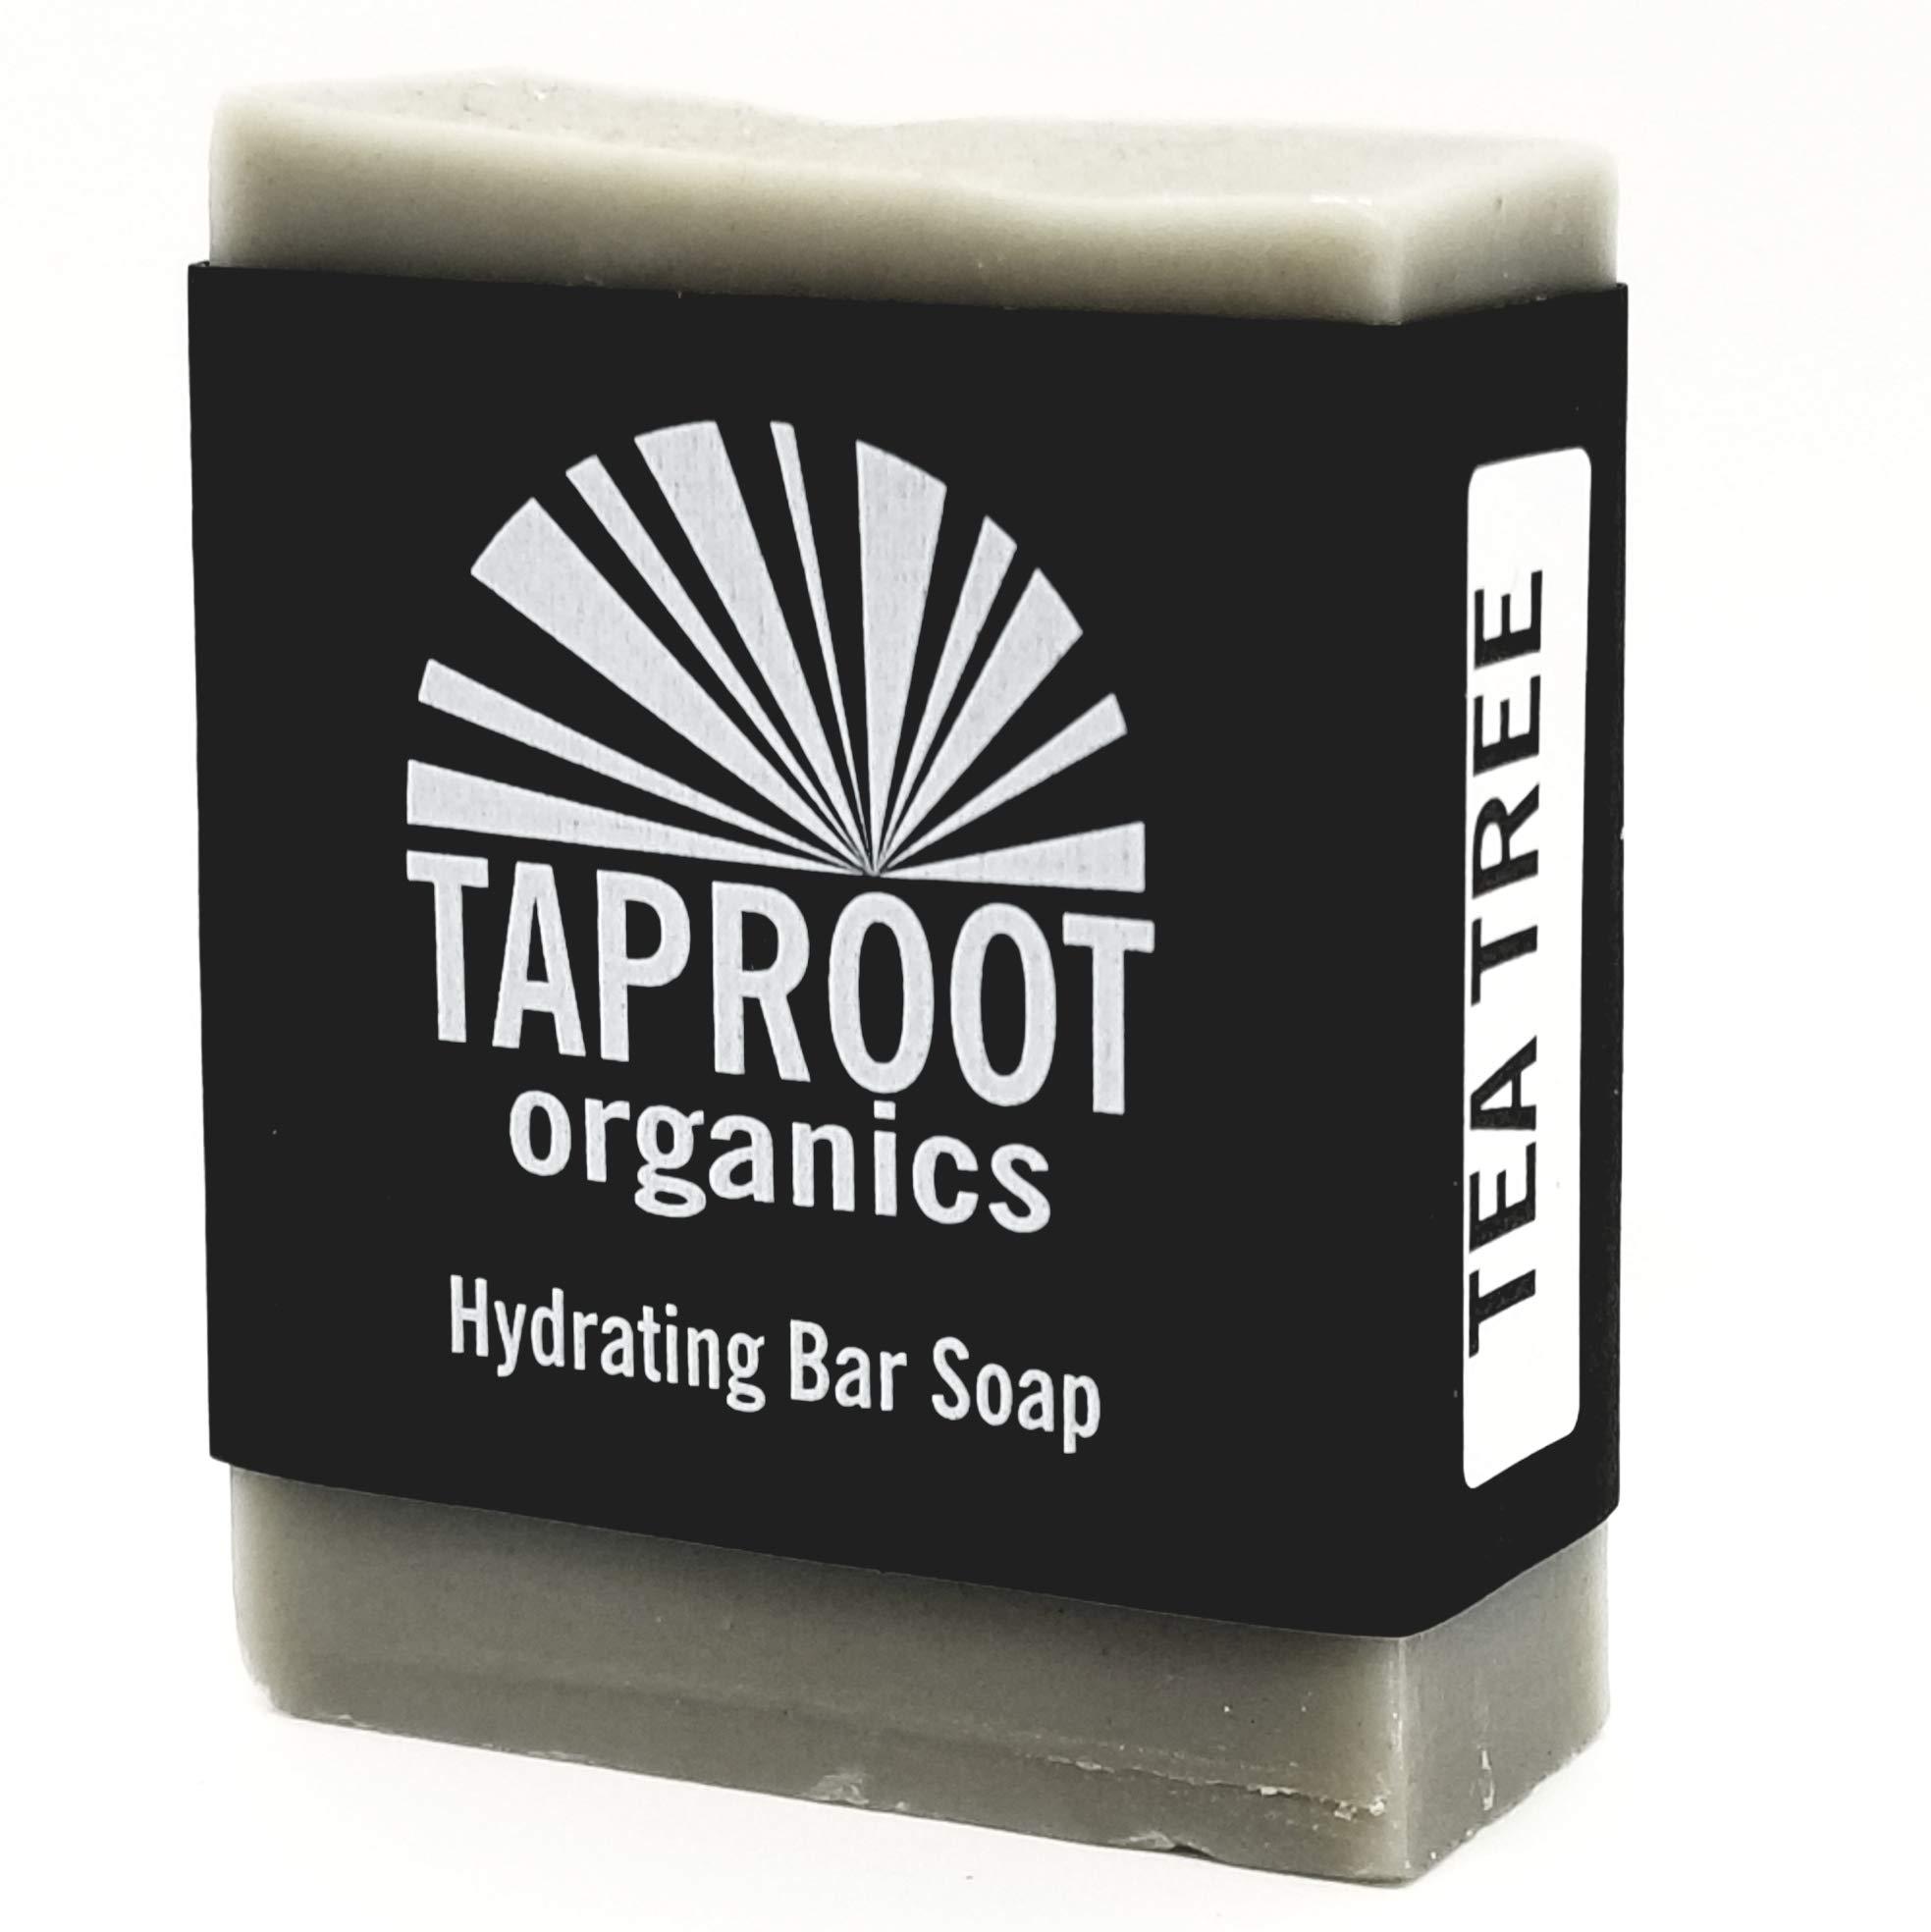 TAPROOT ORGANICS - Tea Tree Cold Process Bentonite Clay Bar Soap Handmade Body and Face bar for the ENTIRE FAMILY! (vegan)